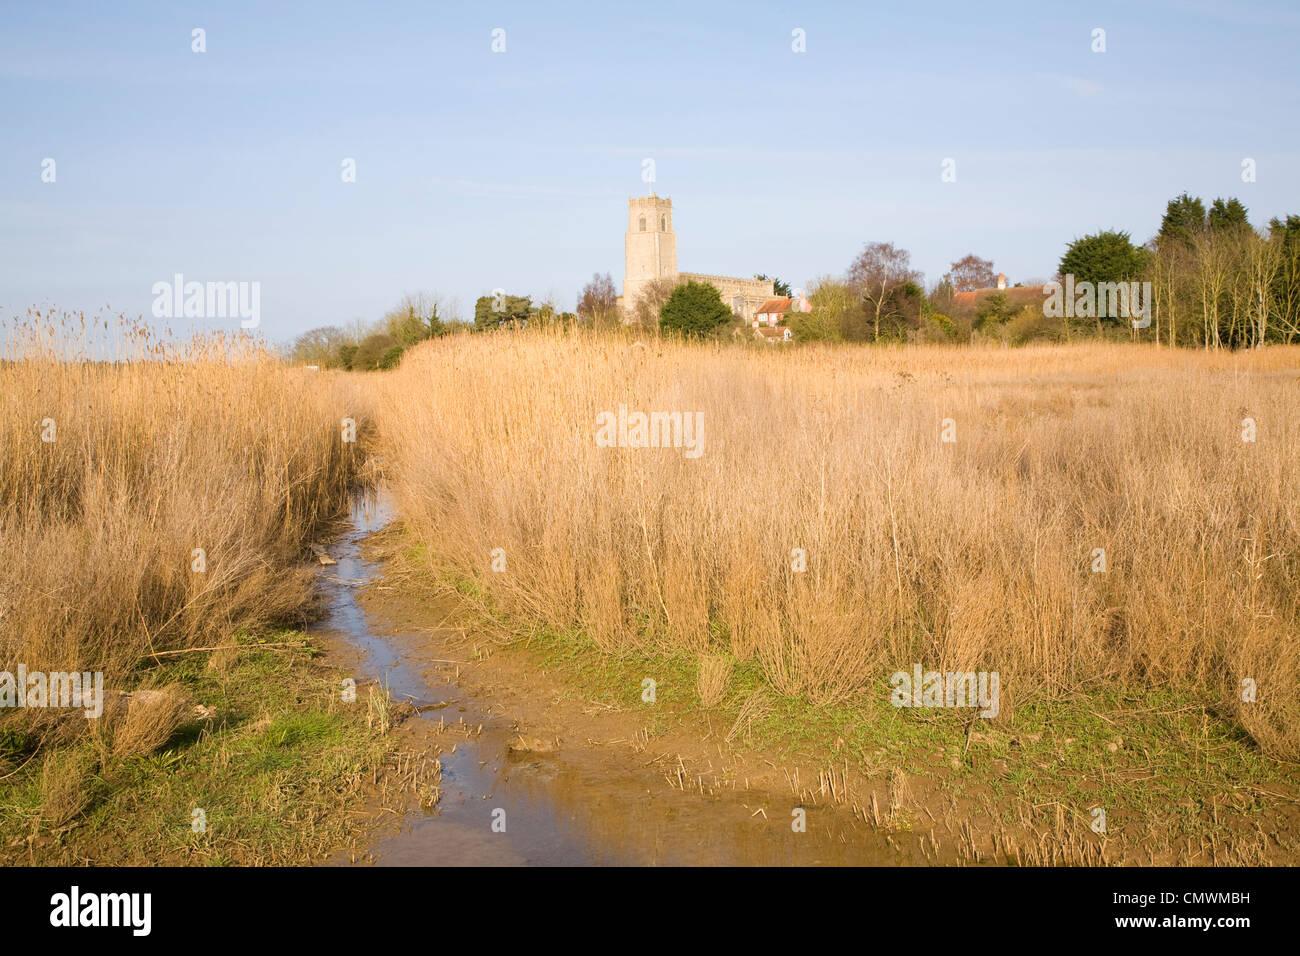 Blyhburgh church seen through marshland reeds, Suffolk, England - Stock Image